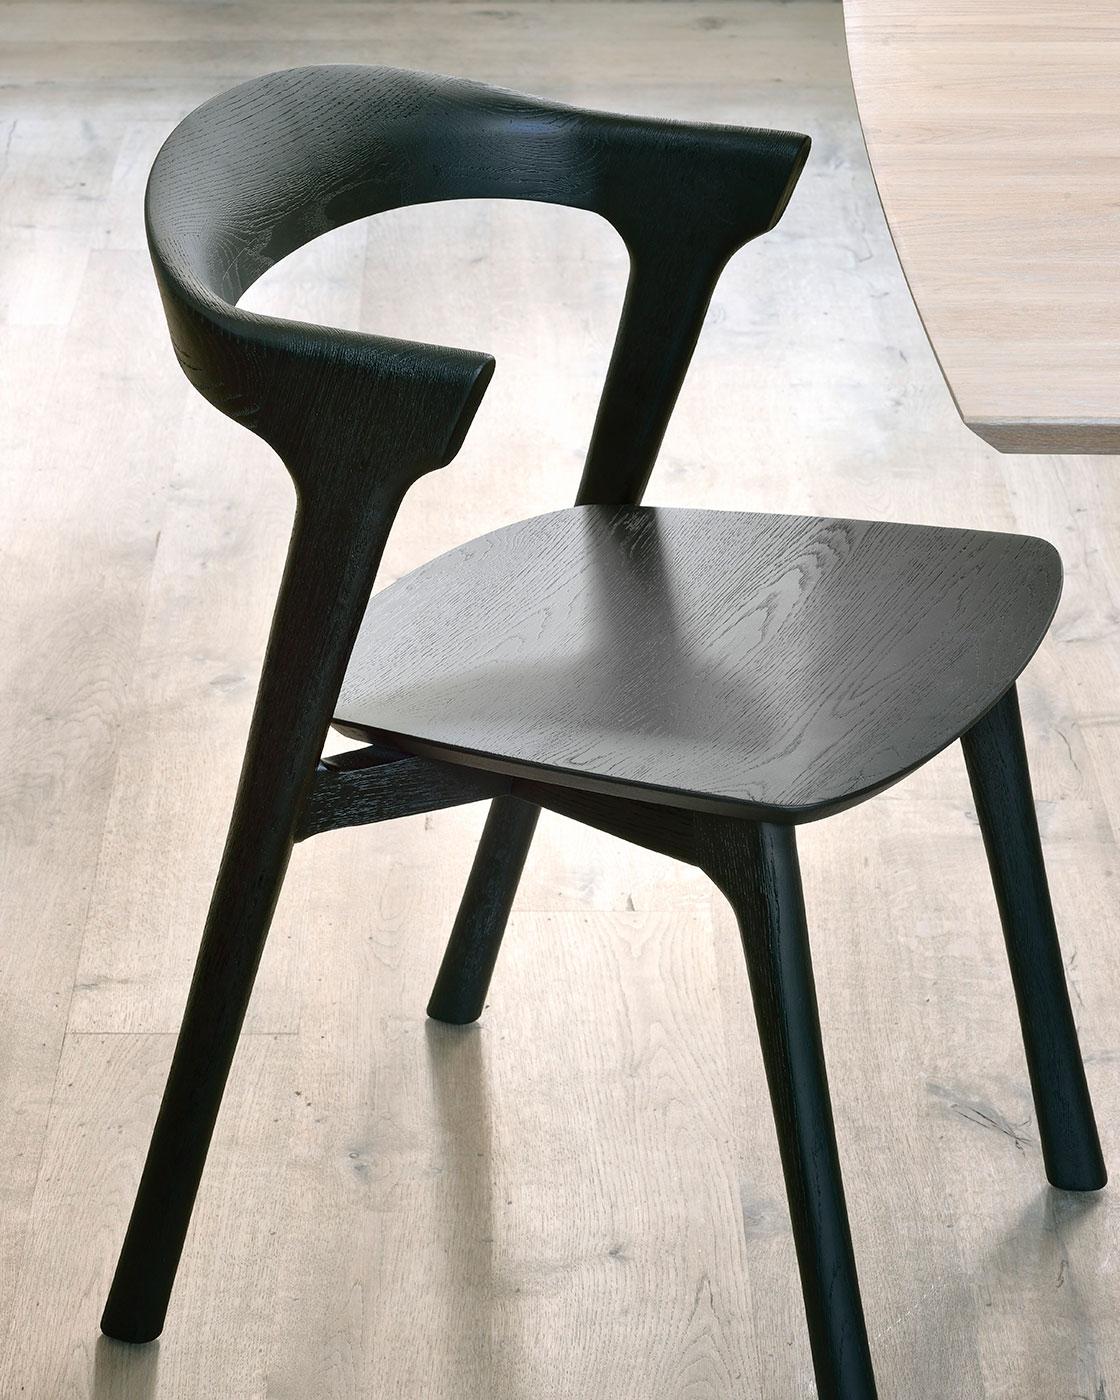 Ethnicraft-Bok-dining-chair-oak-black